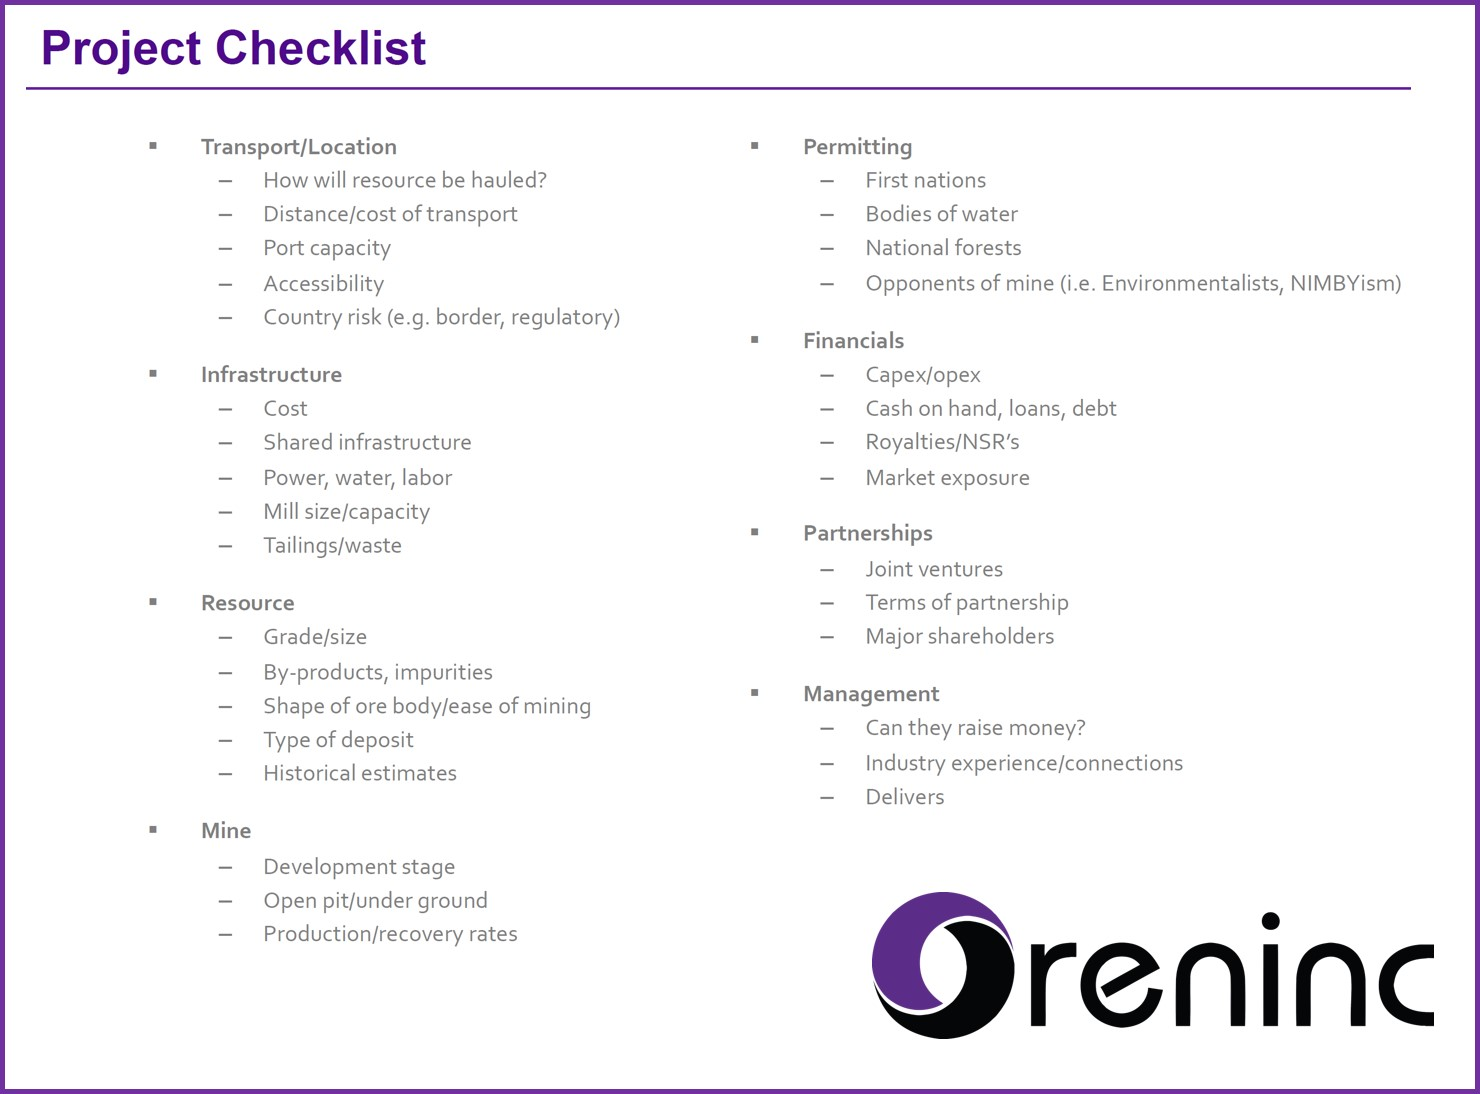 Oreninc ProjectChecklist